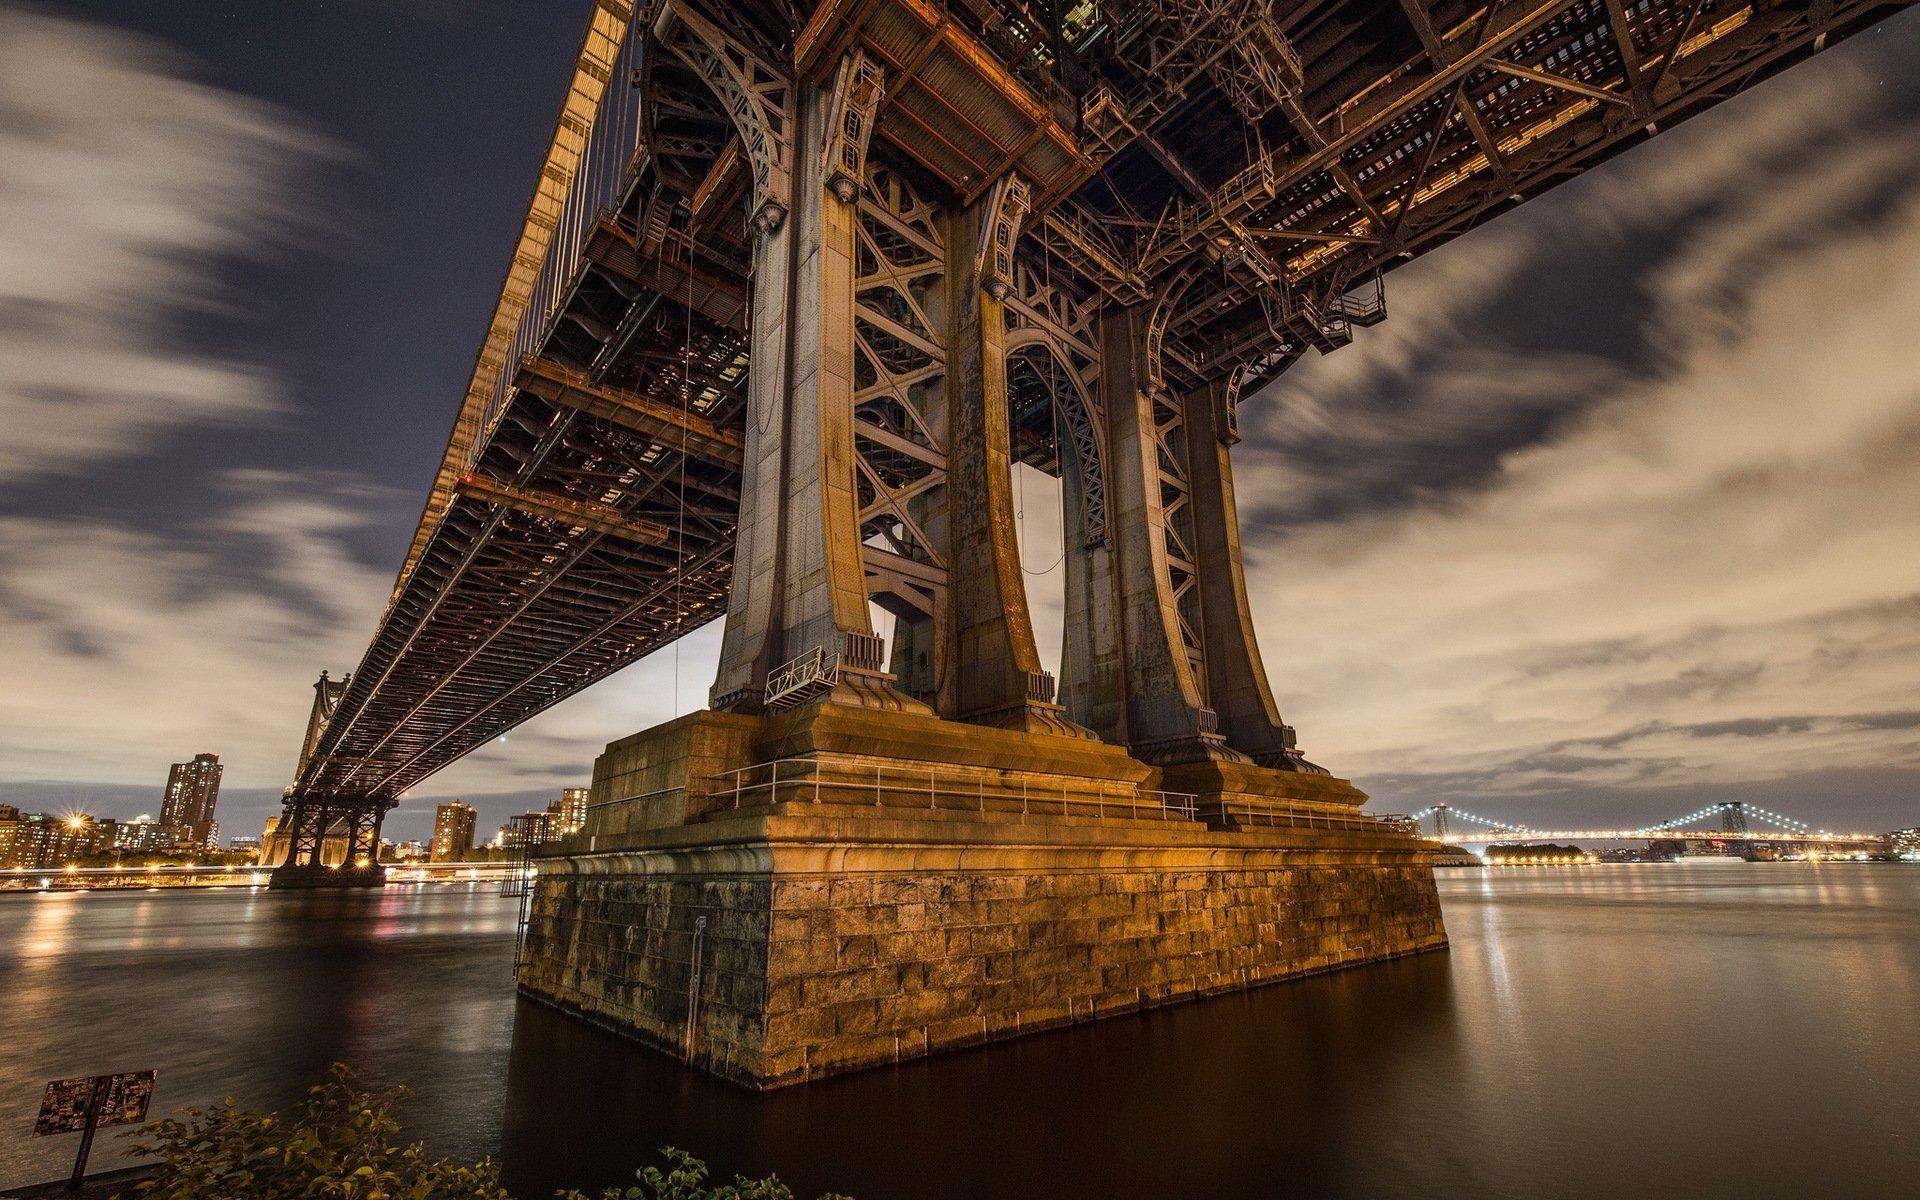 London Hd Wallpaper Iphone 6 Manhattan Bridge Full Hd Wallpaper And Background Image